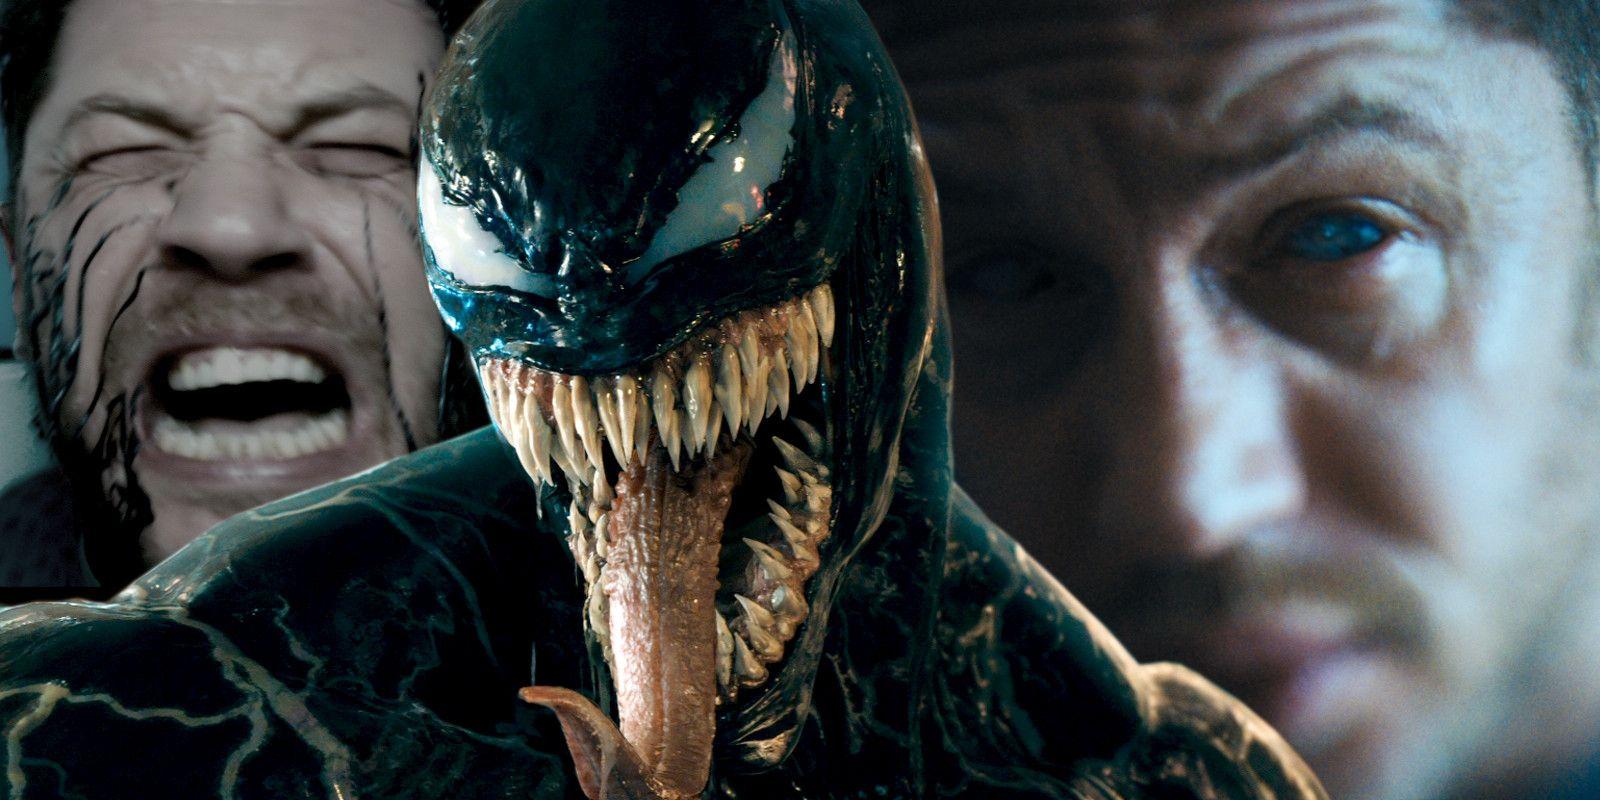 venom viral marketing teasing new trailer release next week